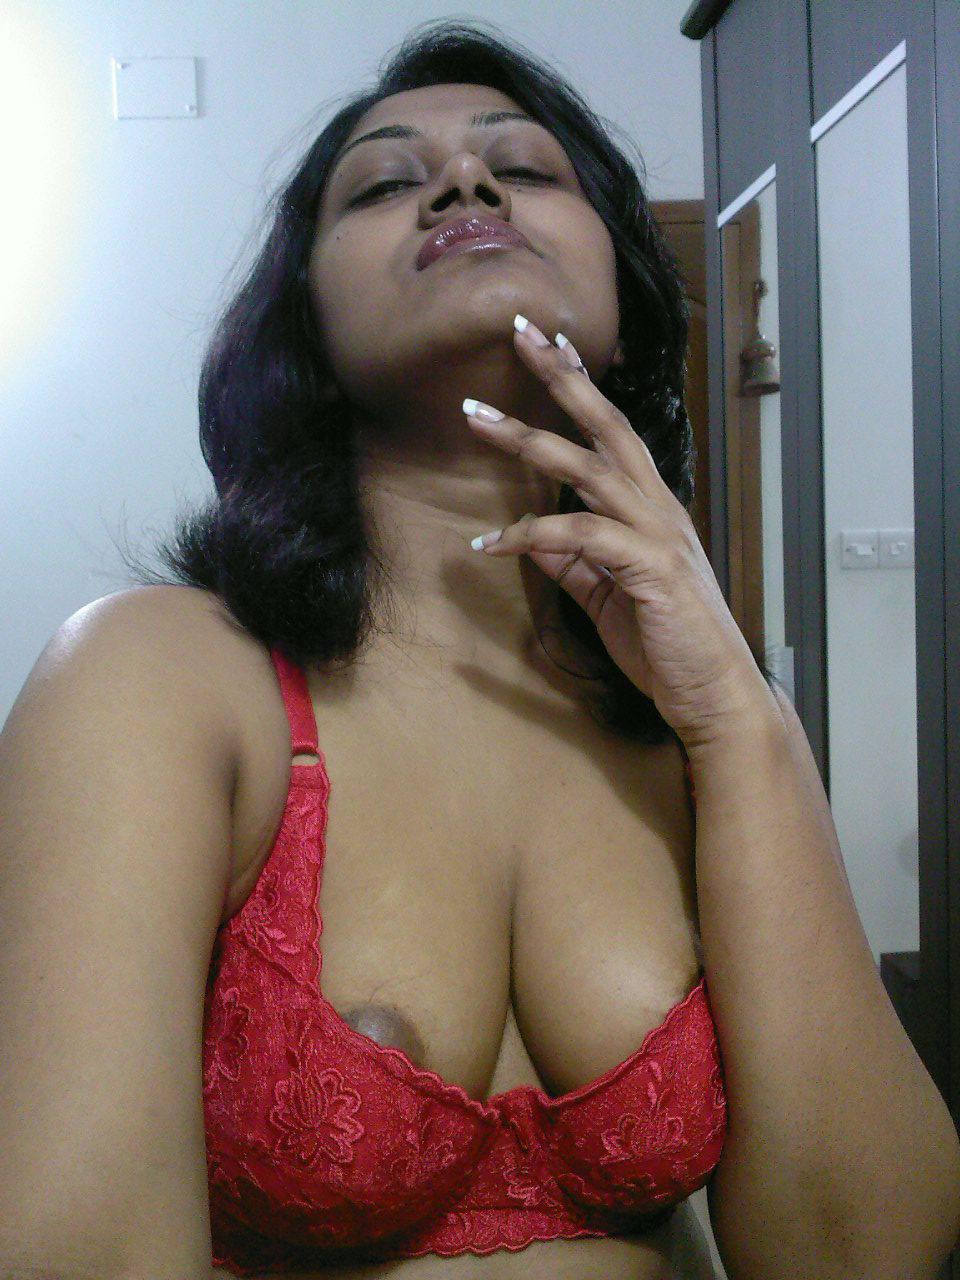 lara dutta nude